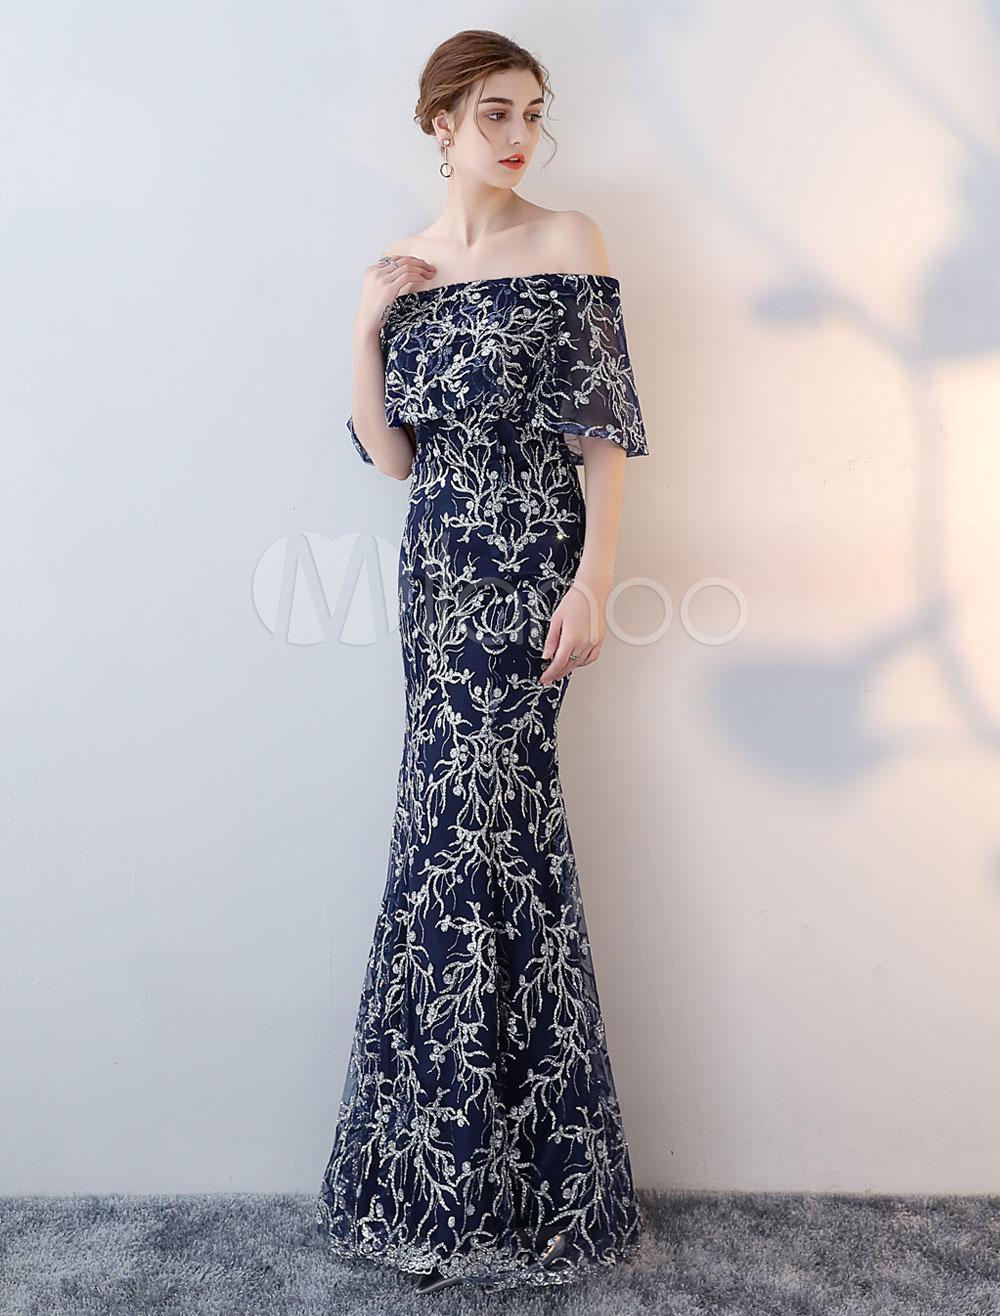 c4f03cfd3 Vestido de noche de color azul marino oscuro con 1 2 manga con escote barco  ...